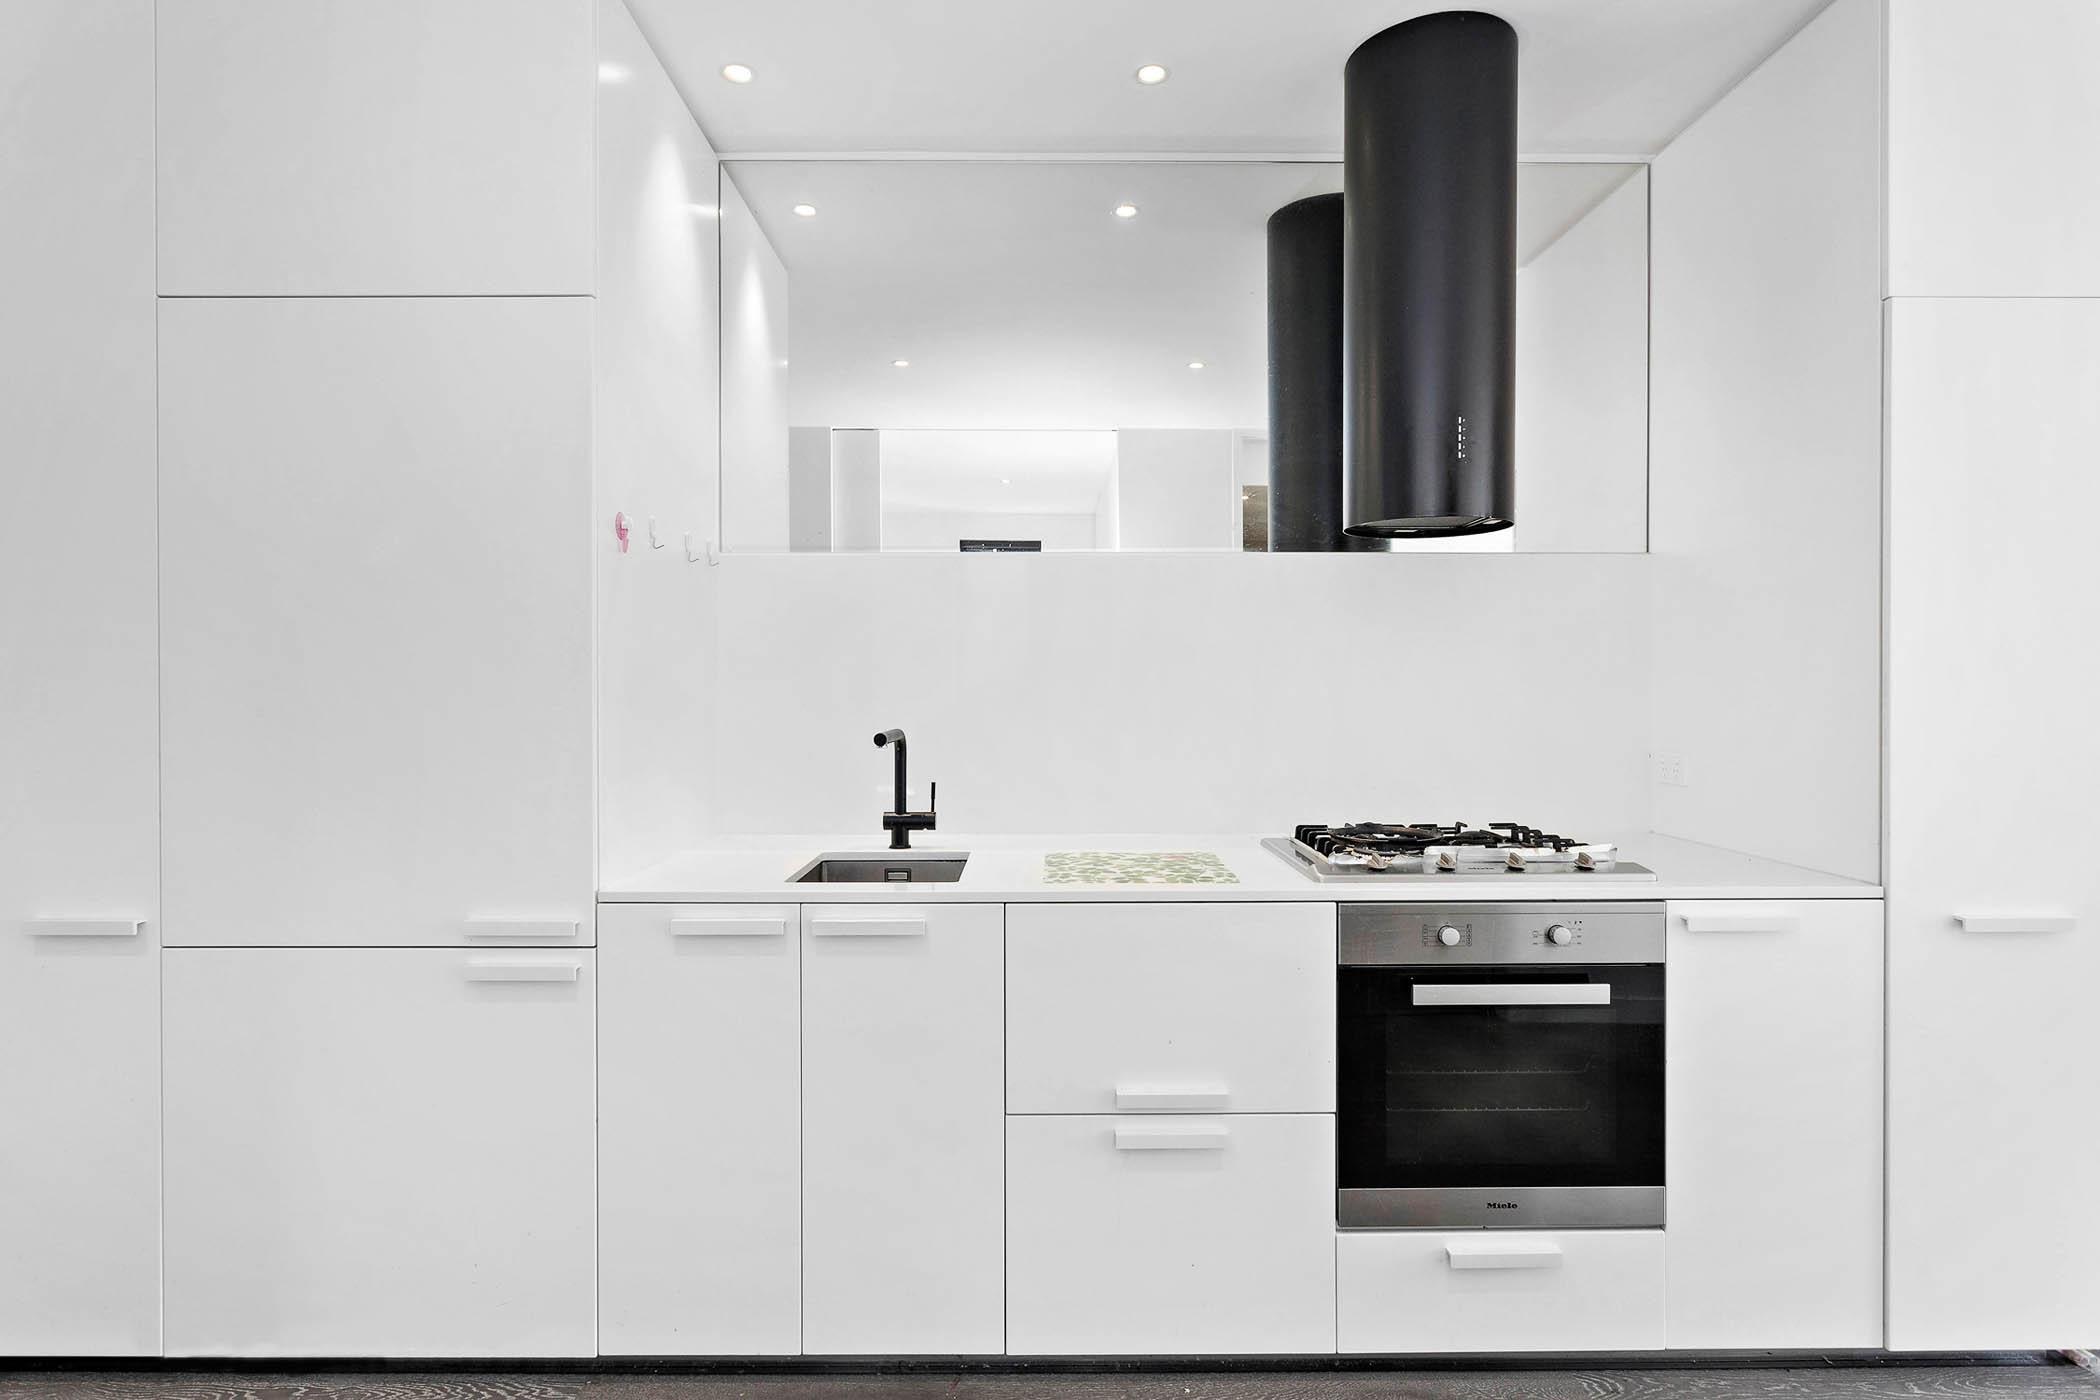 104/518-Swanston-Street,-Carlton-Student-Accommodation-Melbourne-Kitchen-Unilodgers